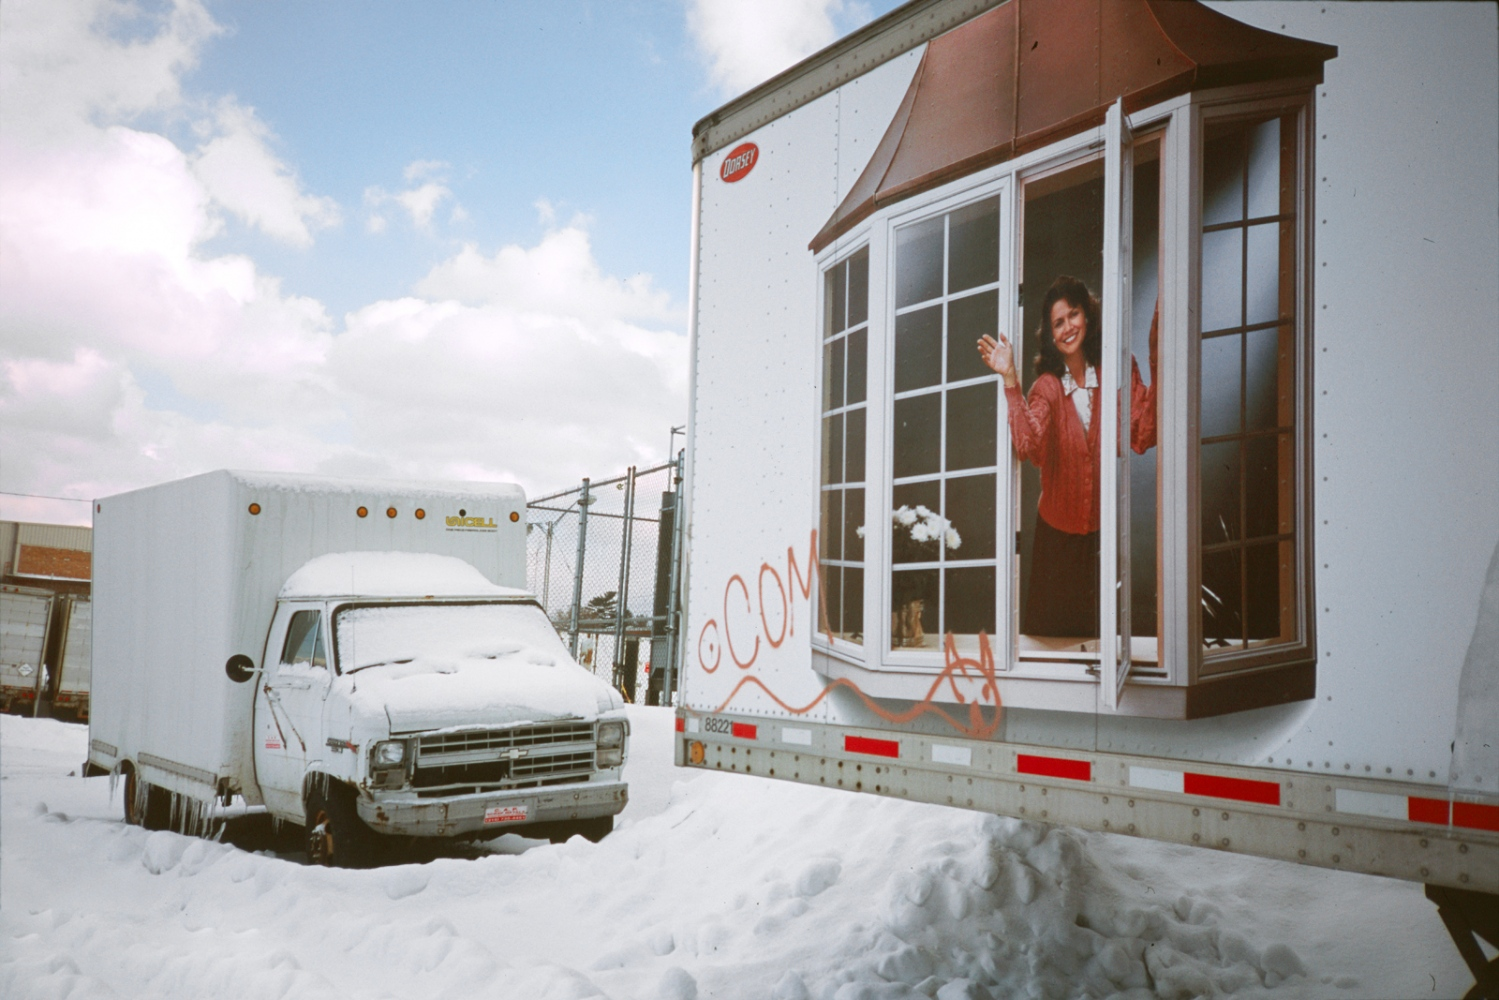 Broad Street Trailer, Utica, NY